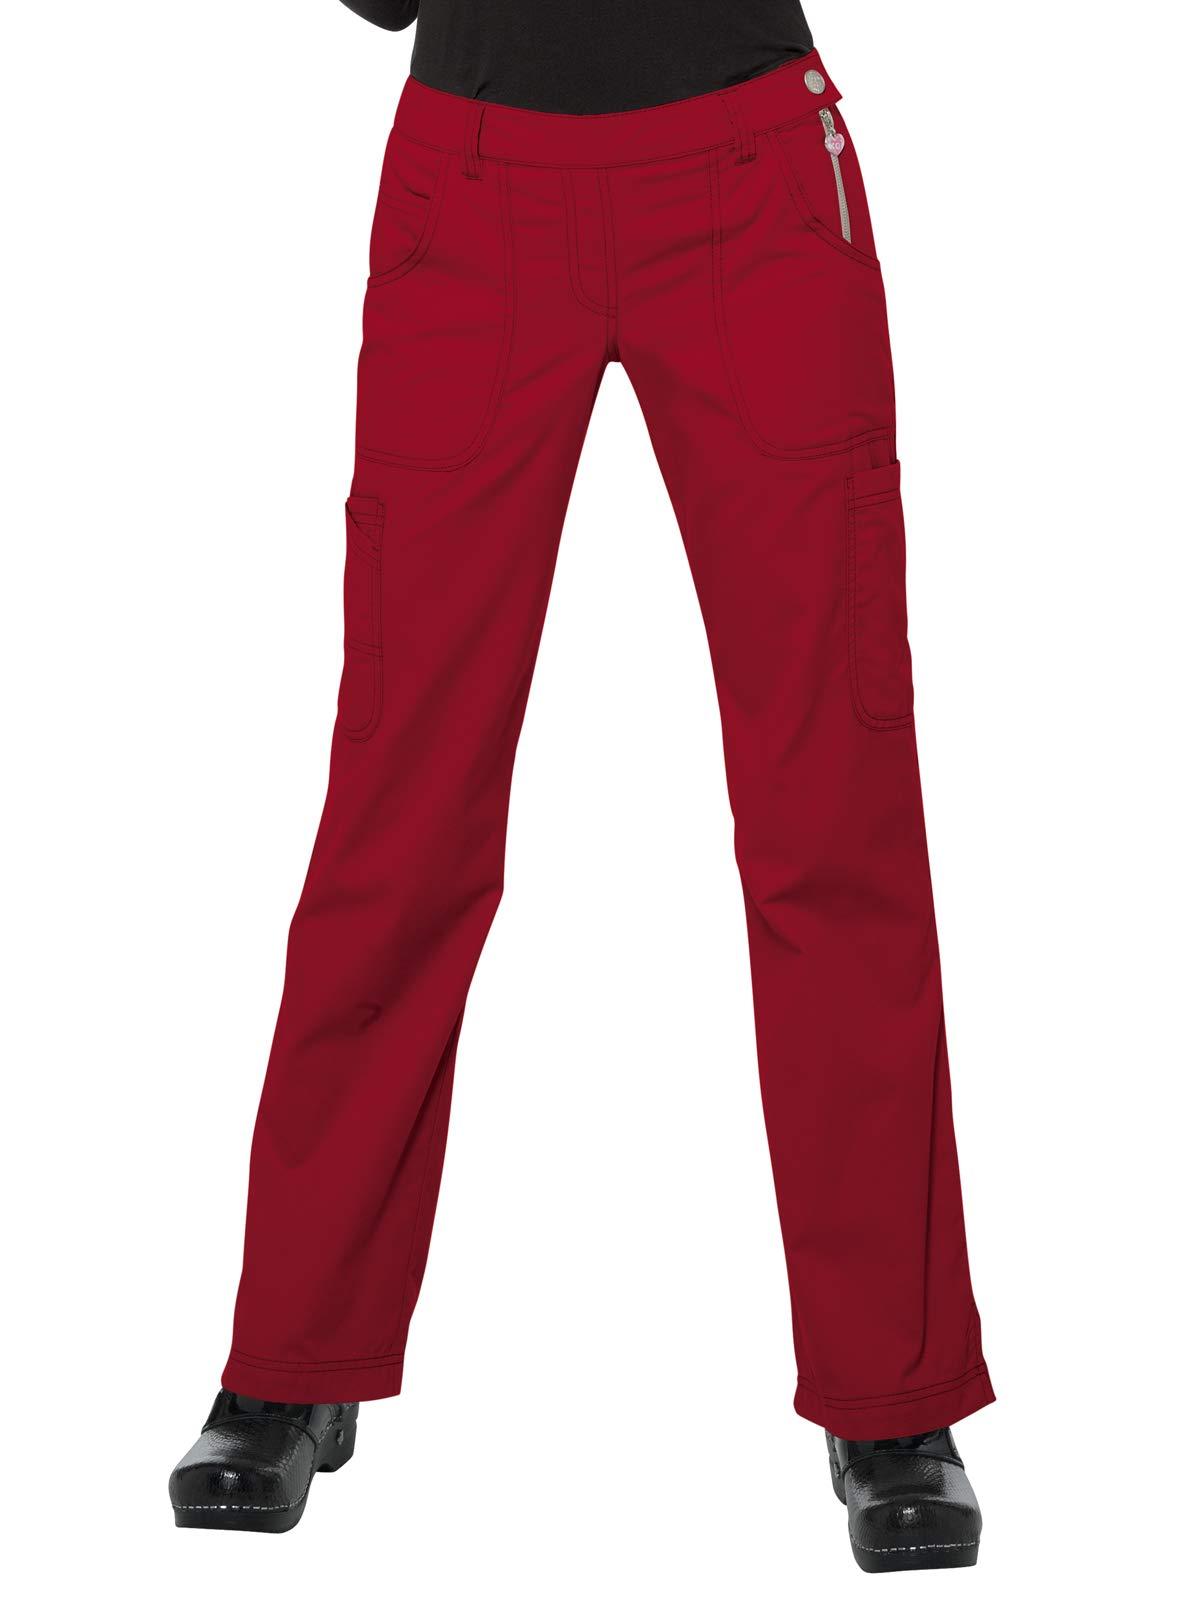 KOI Classics Multi-Pocket Ultra Comfort & Sara Scrub Pant for Women